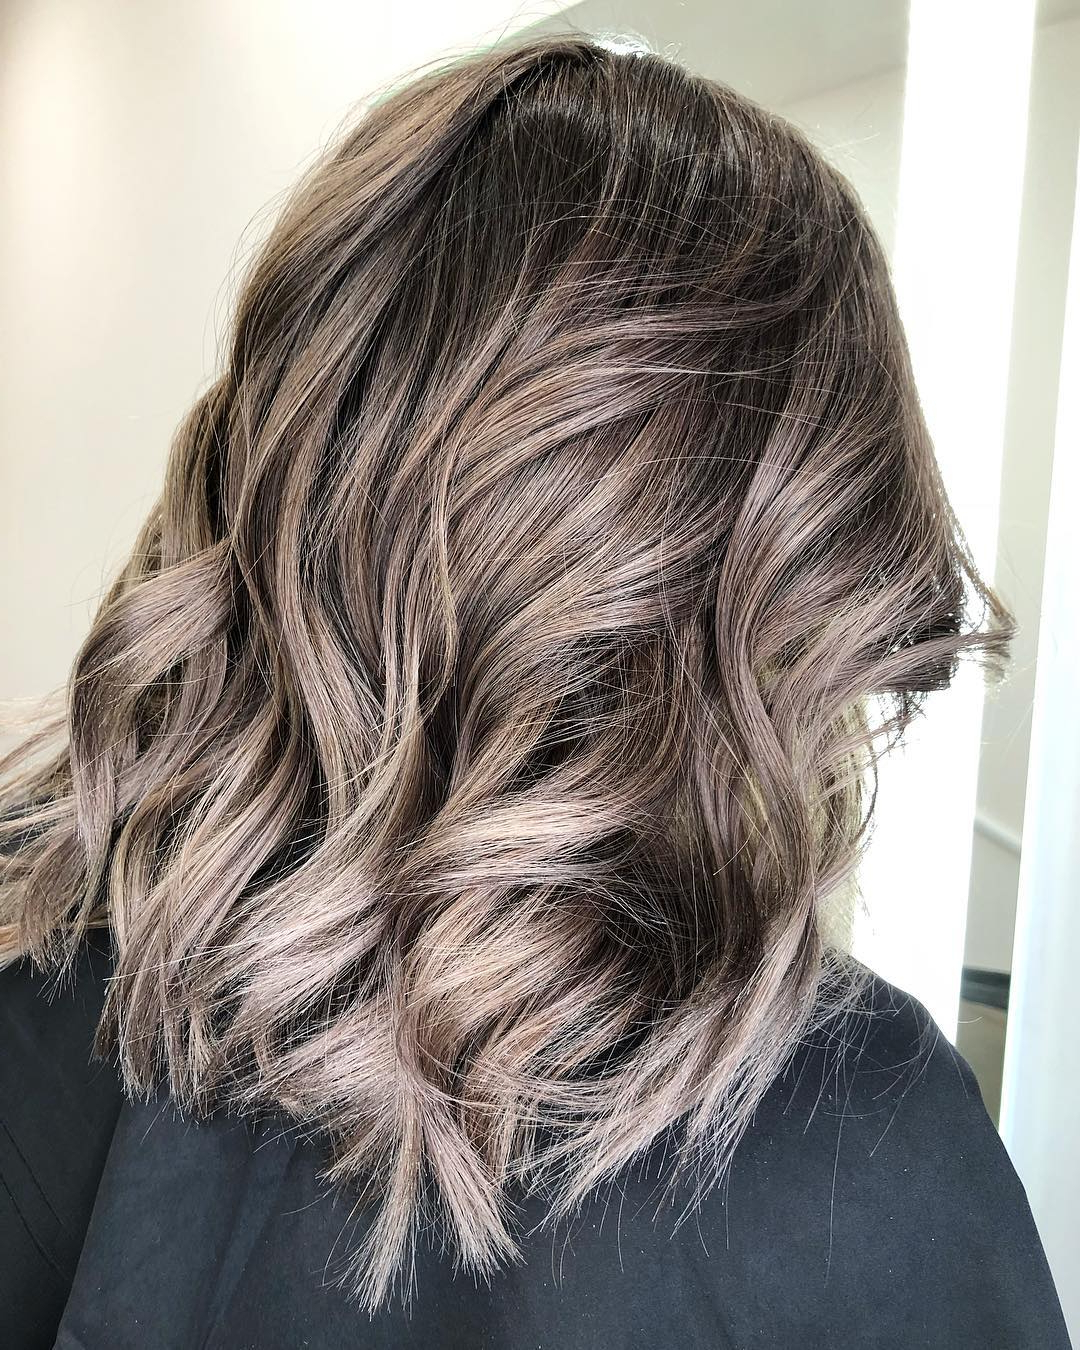 10 Balayage Hair Styles For Medium Length Hair 2019 – Freshen Up Regarding One Length Balayage Bob Hairstyles With Bangs (View 7 of 20)